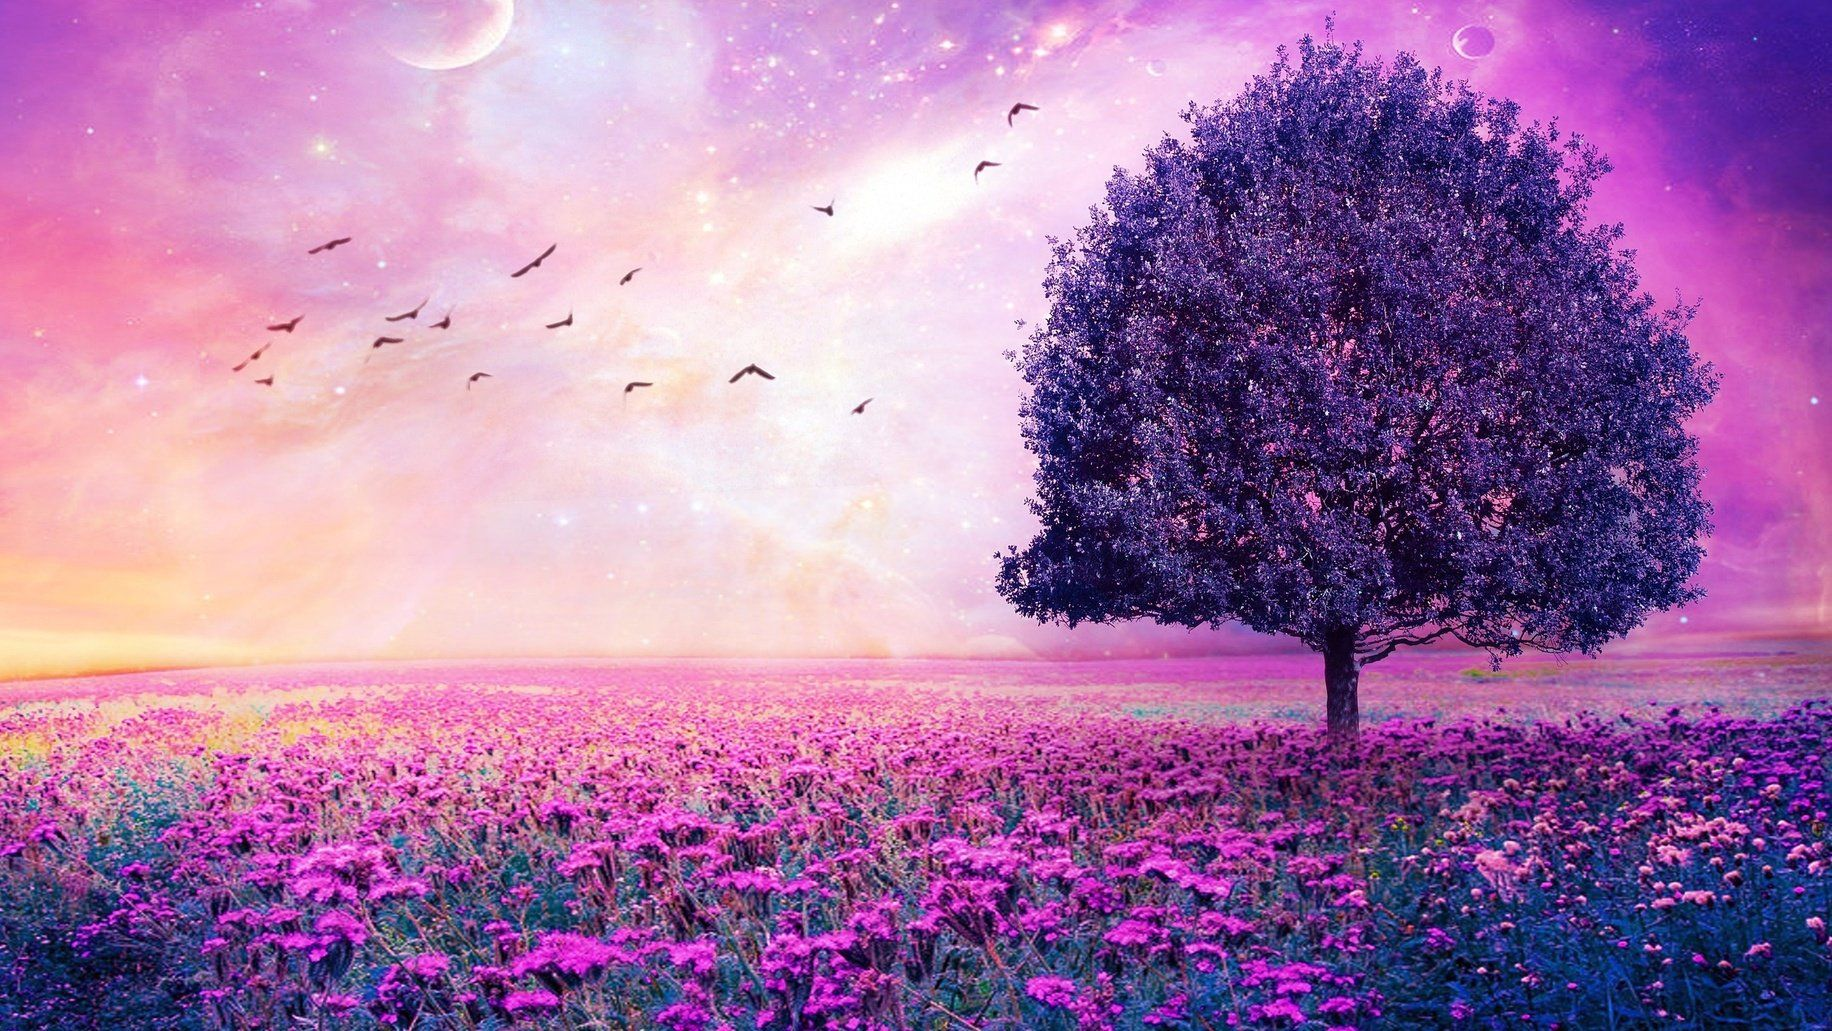 Imagenes Full Hd En 3d Beautiful Tree Girl Wallpaper Wallpaper Pc